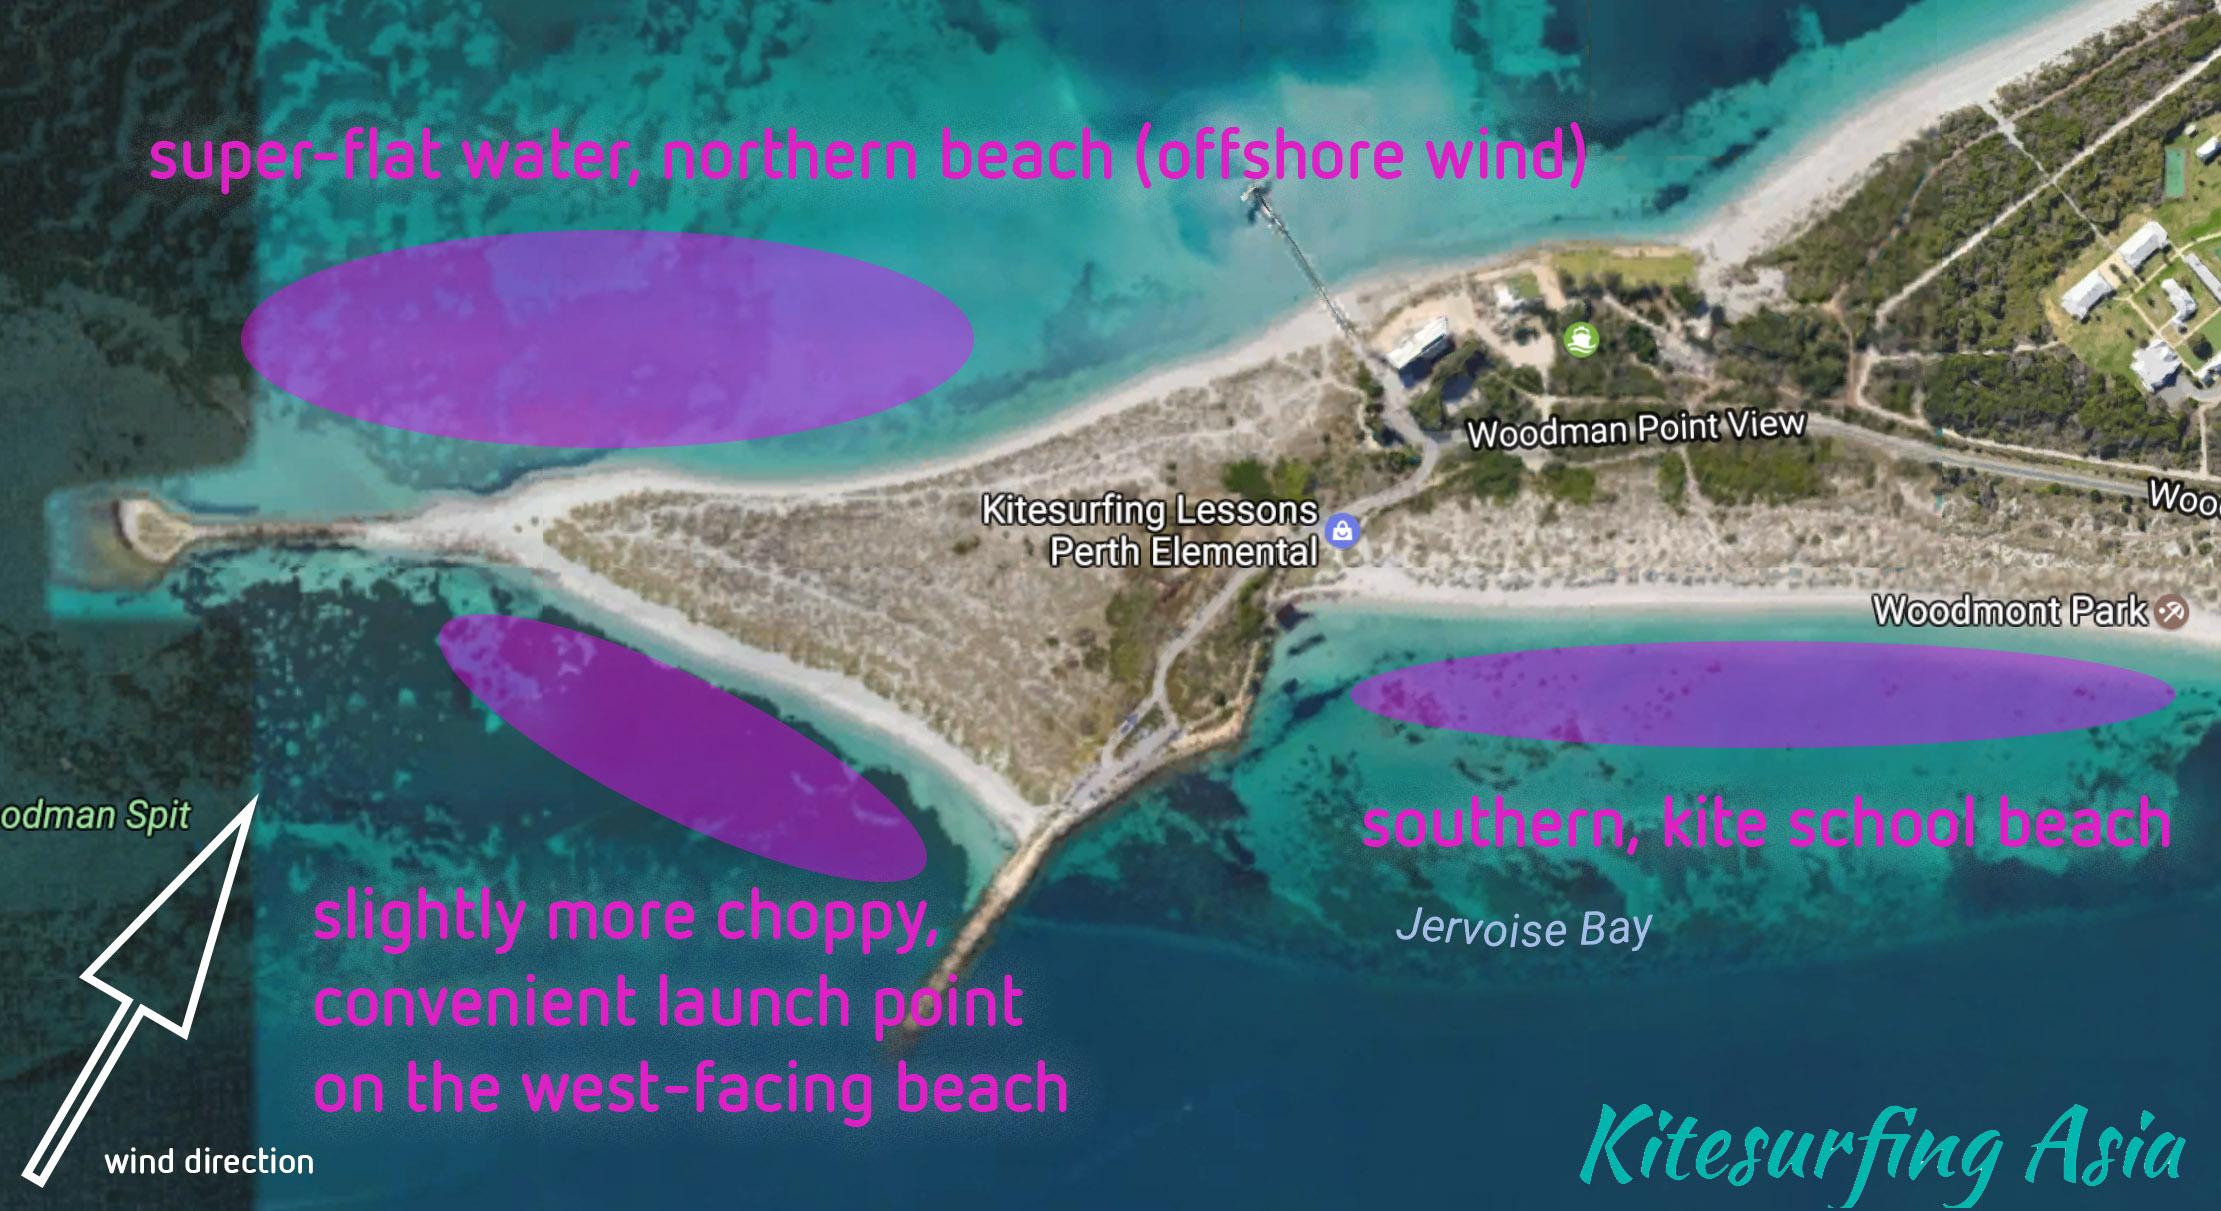 Perth Woodman Point Kitesurfing Spots Overview